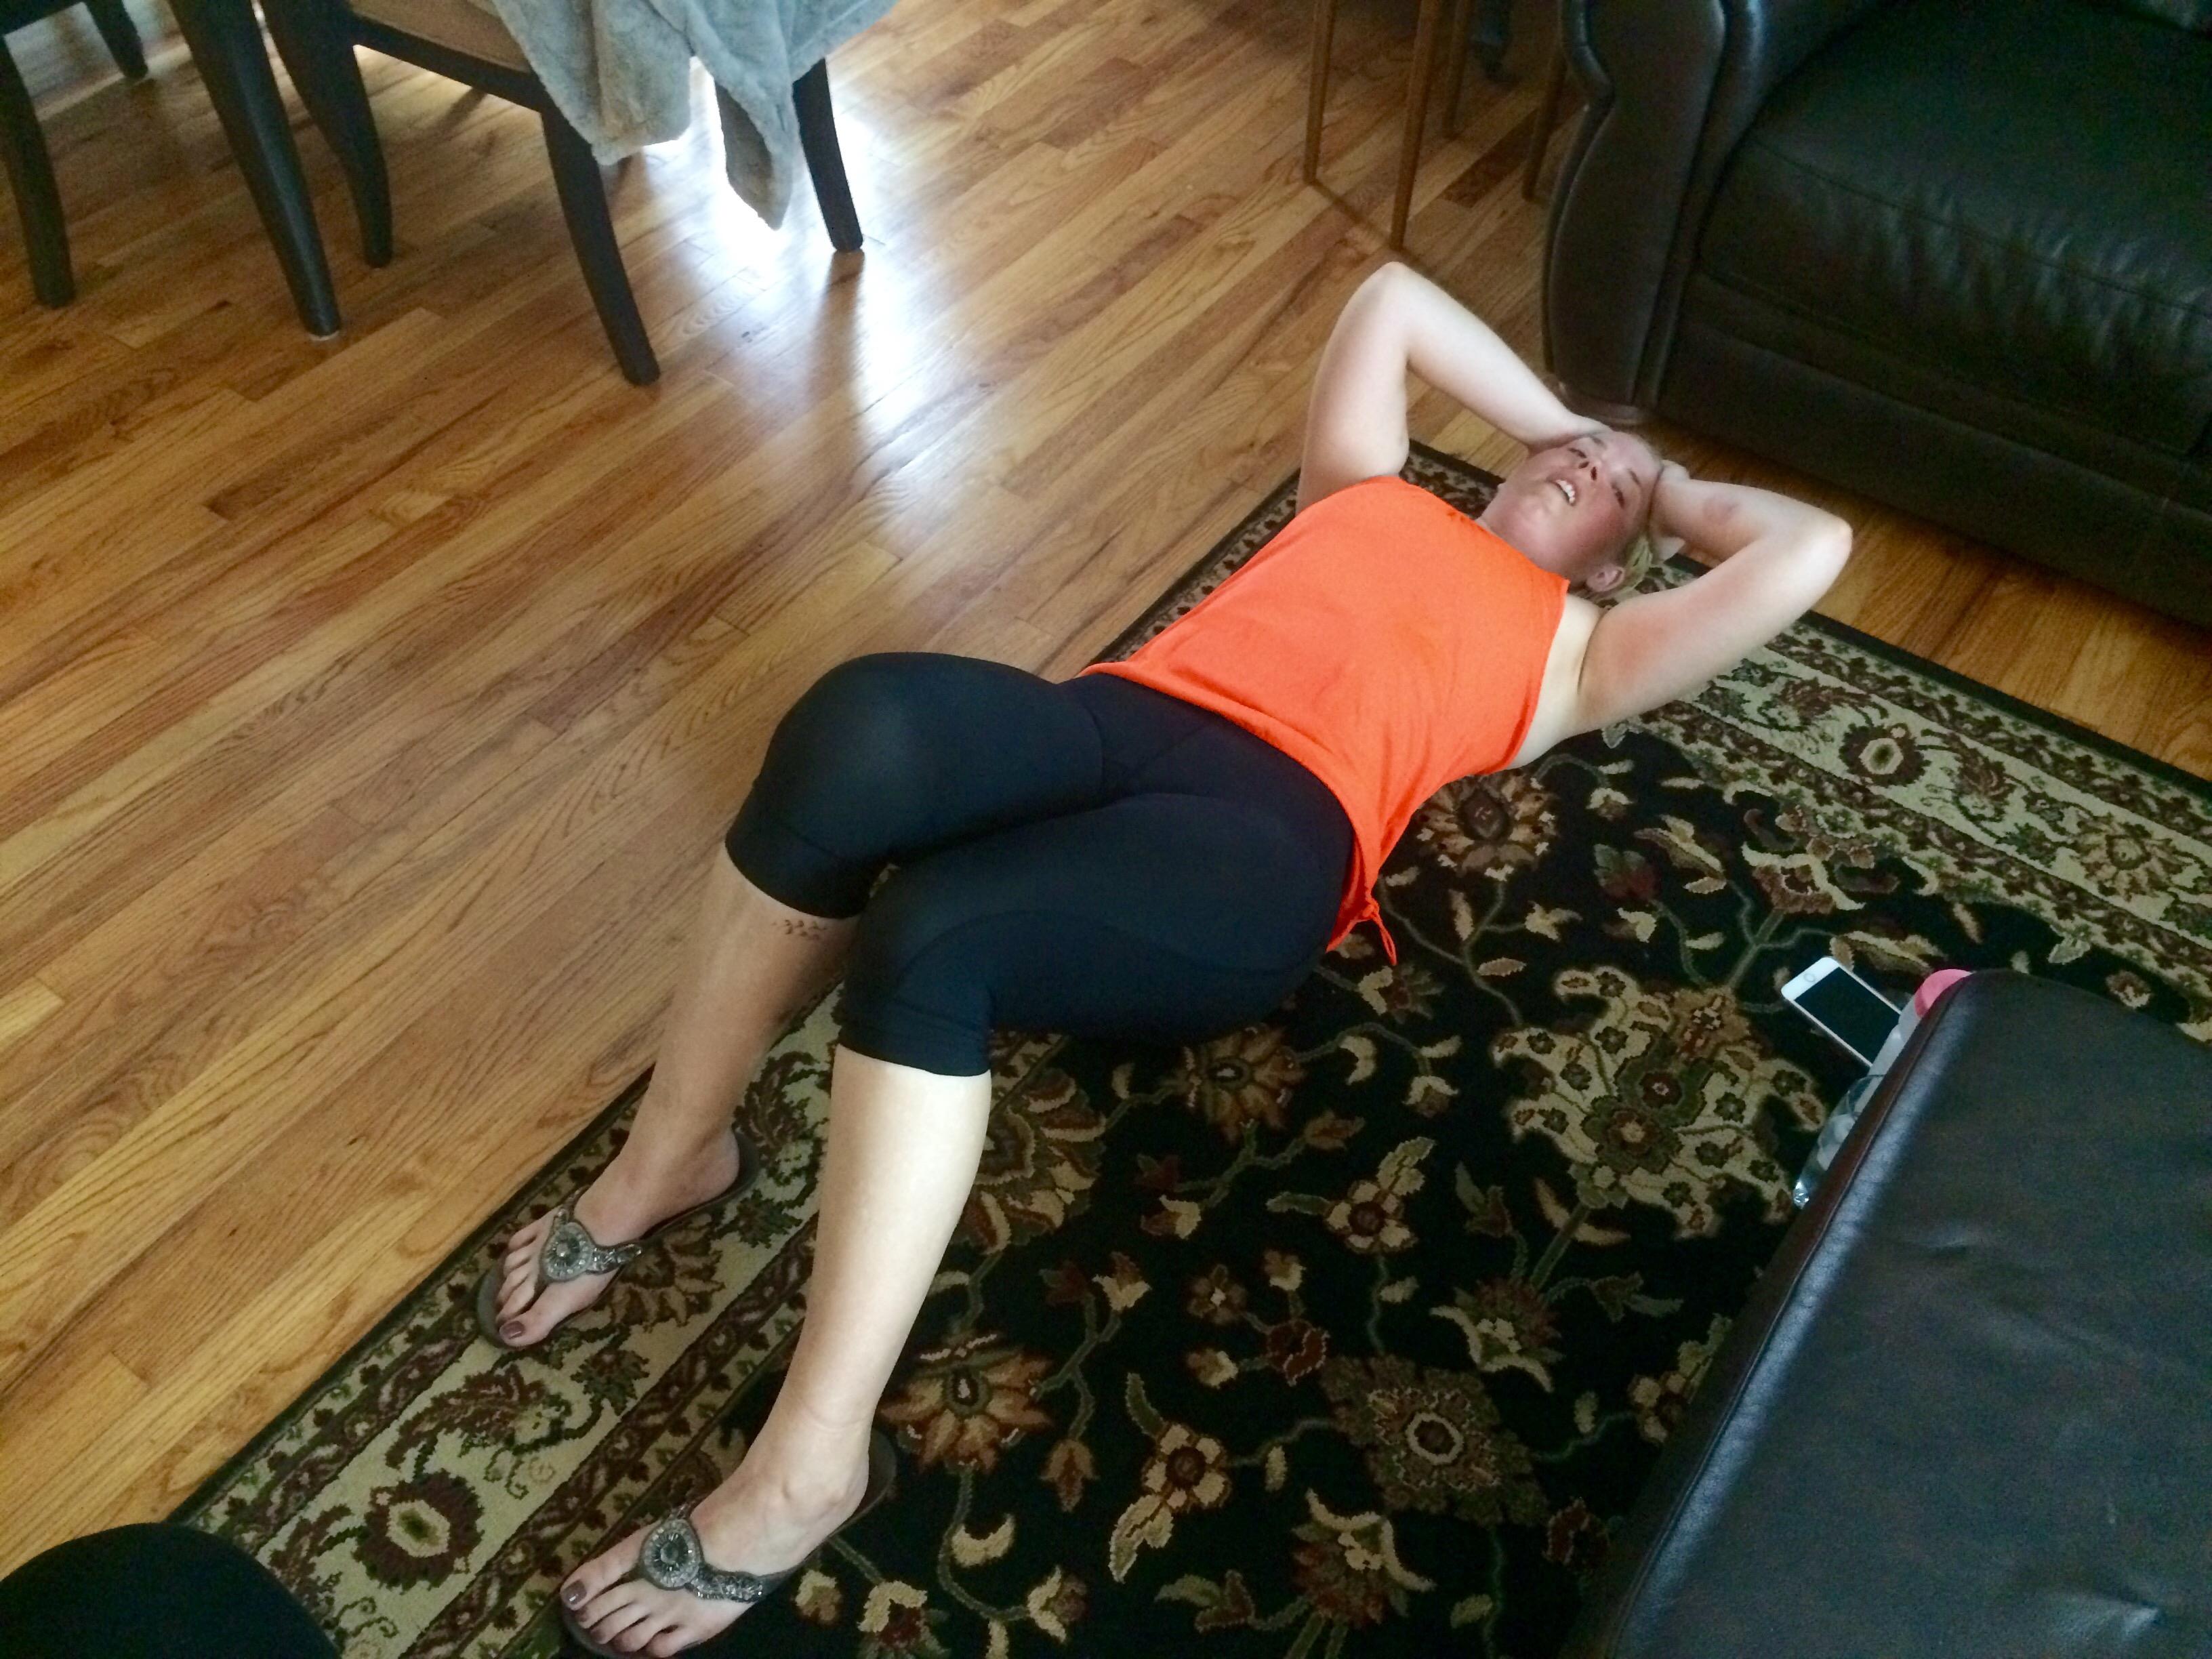 Jules-collapsed-on-floor